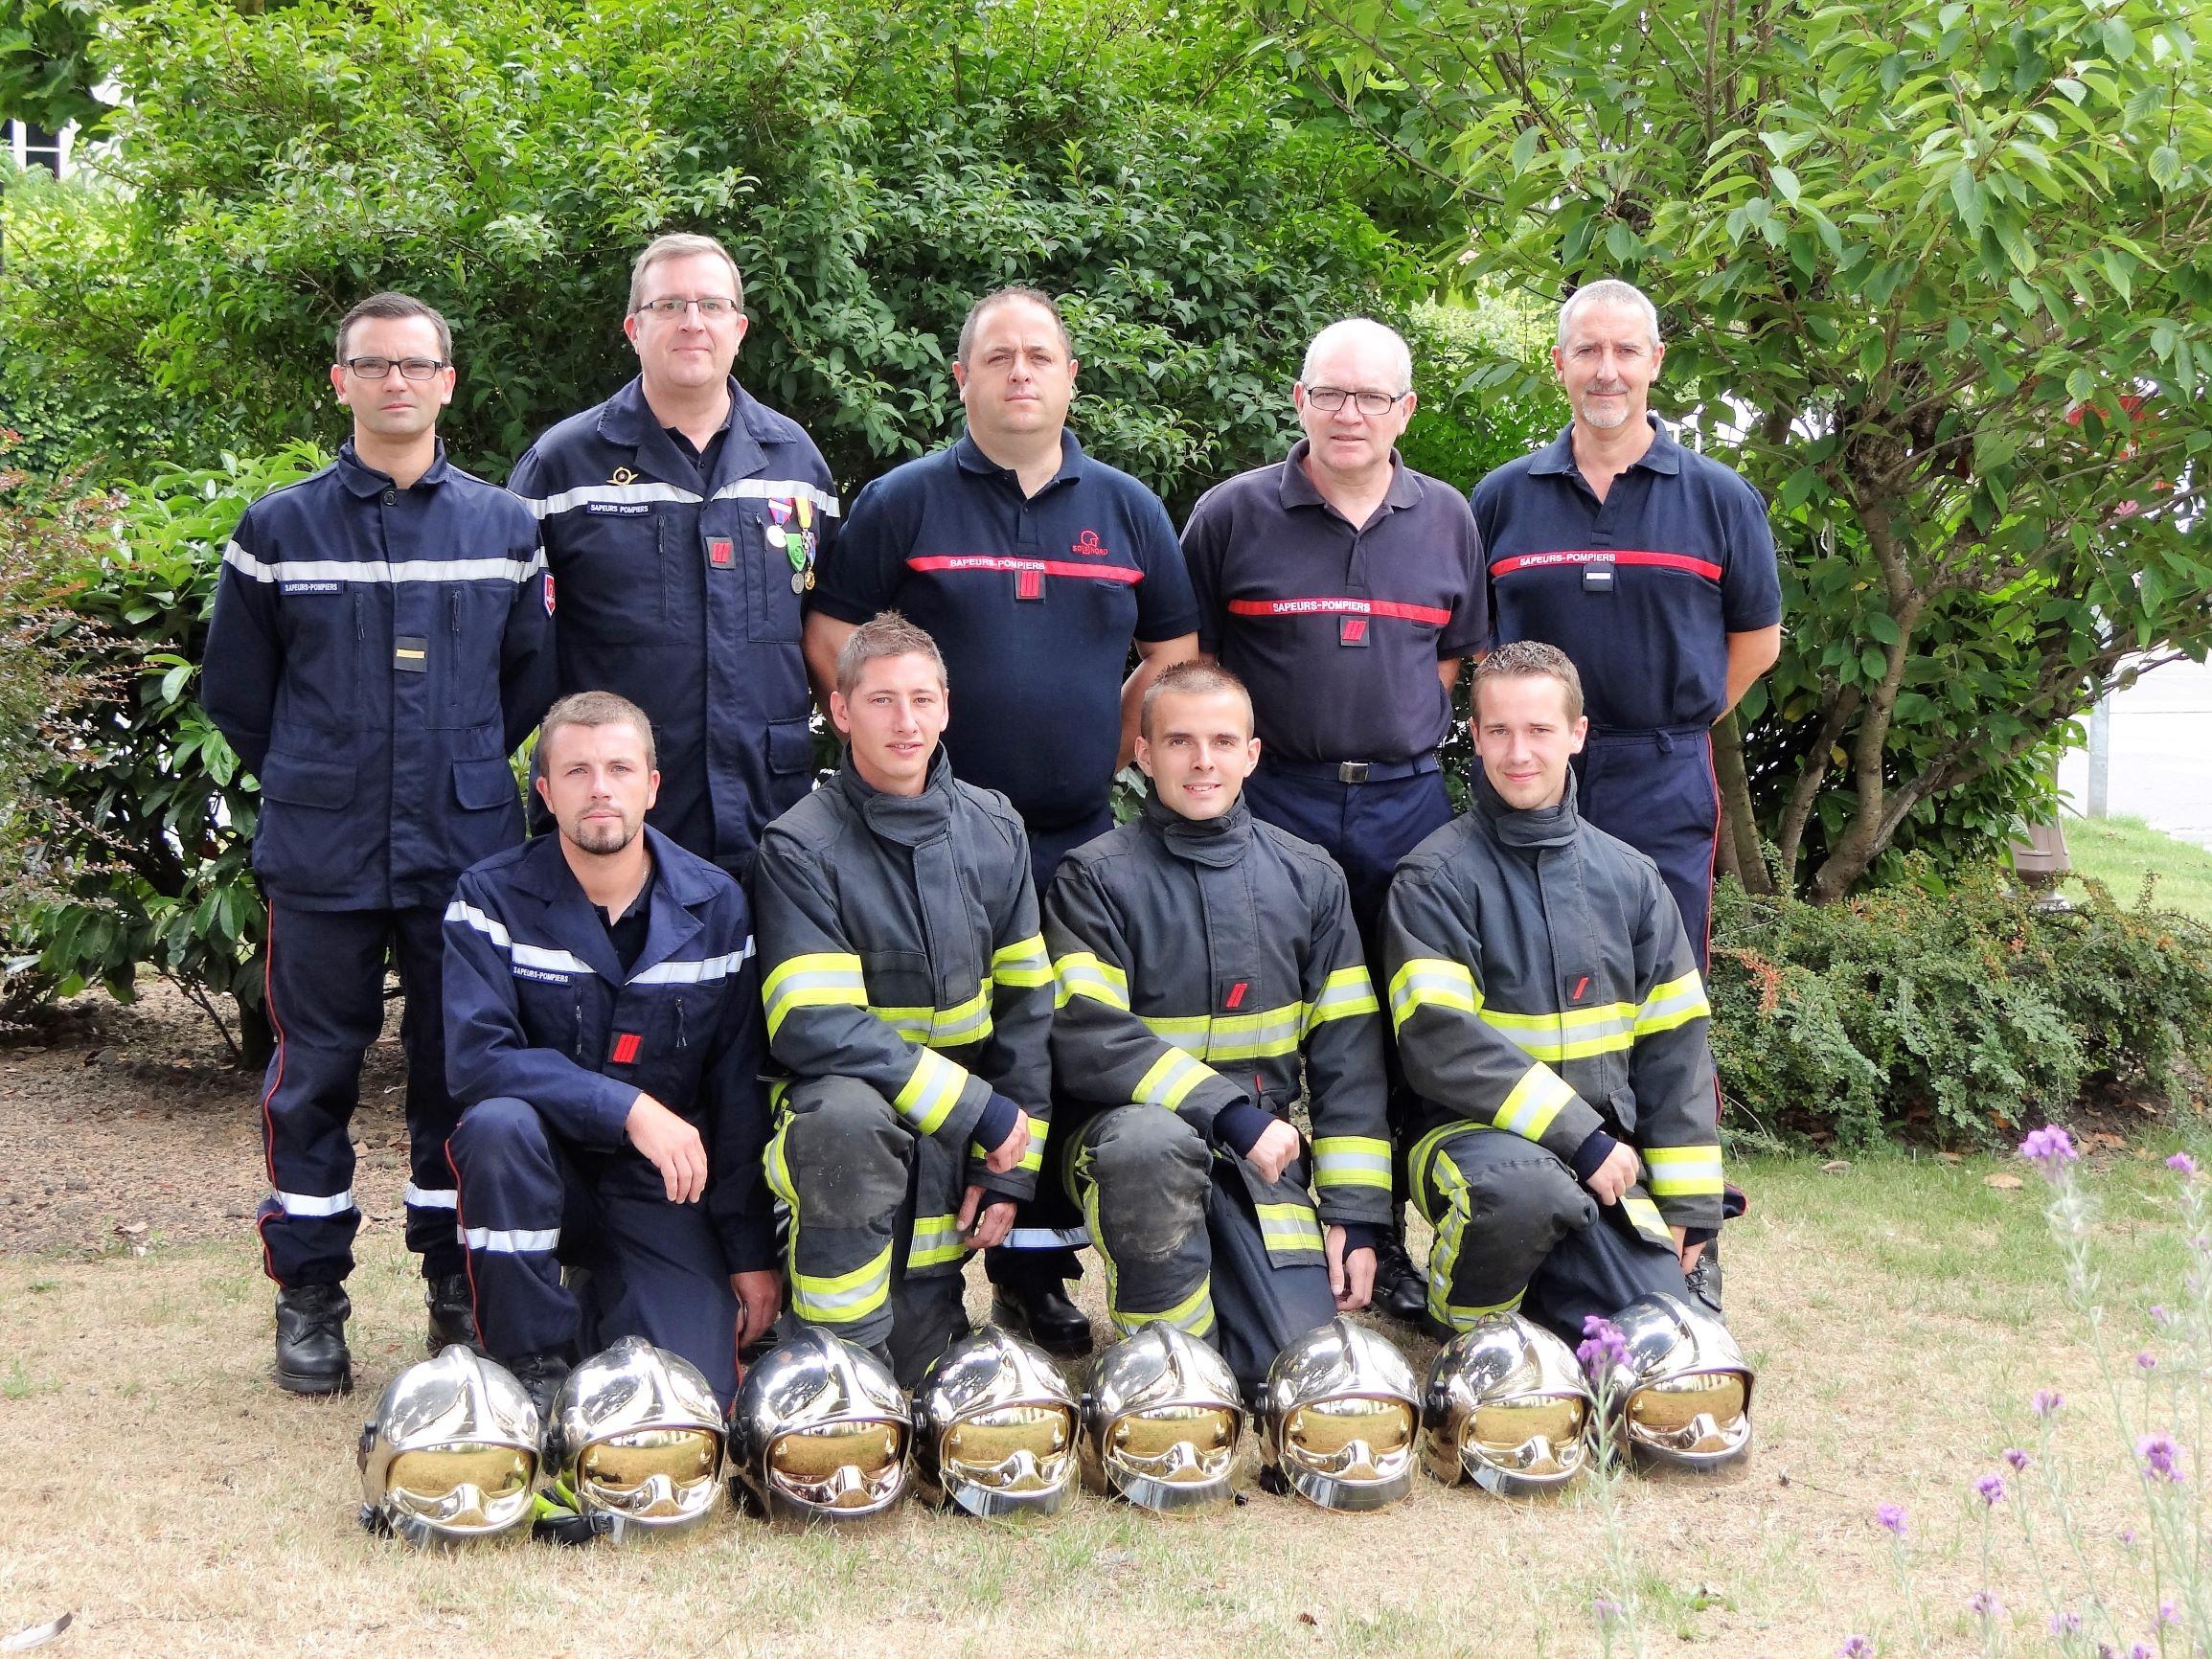 Pompiers_2.JPG